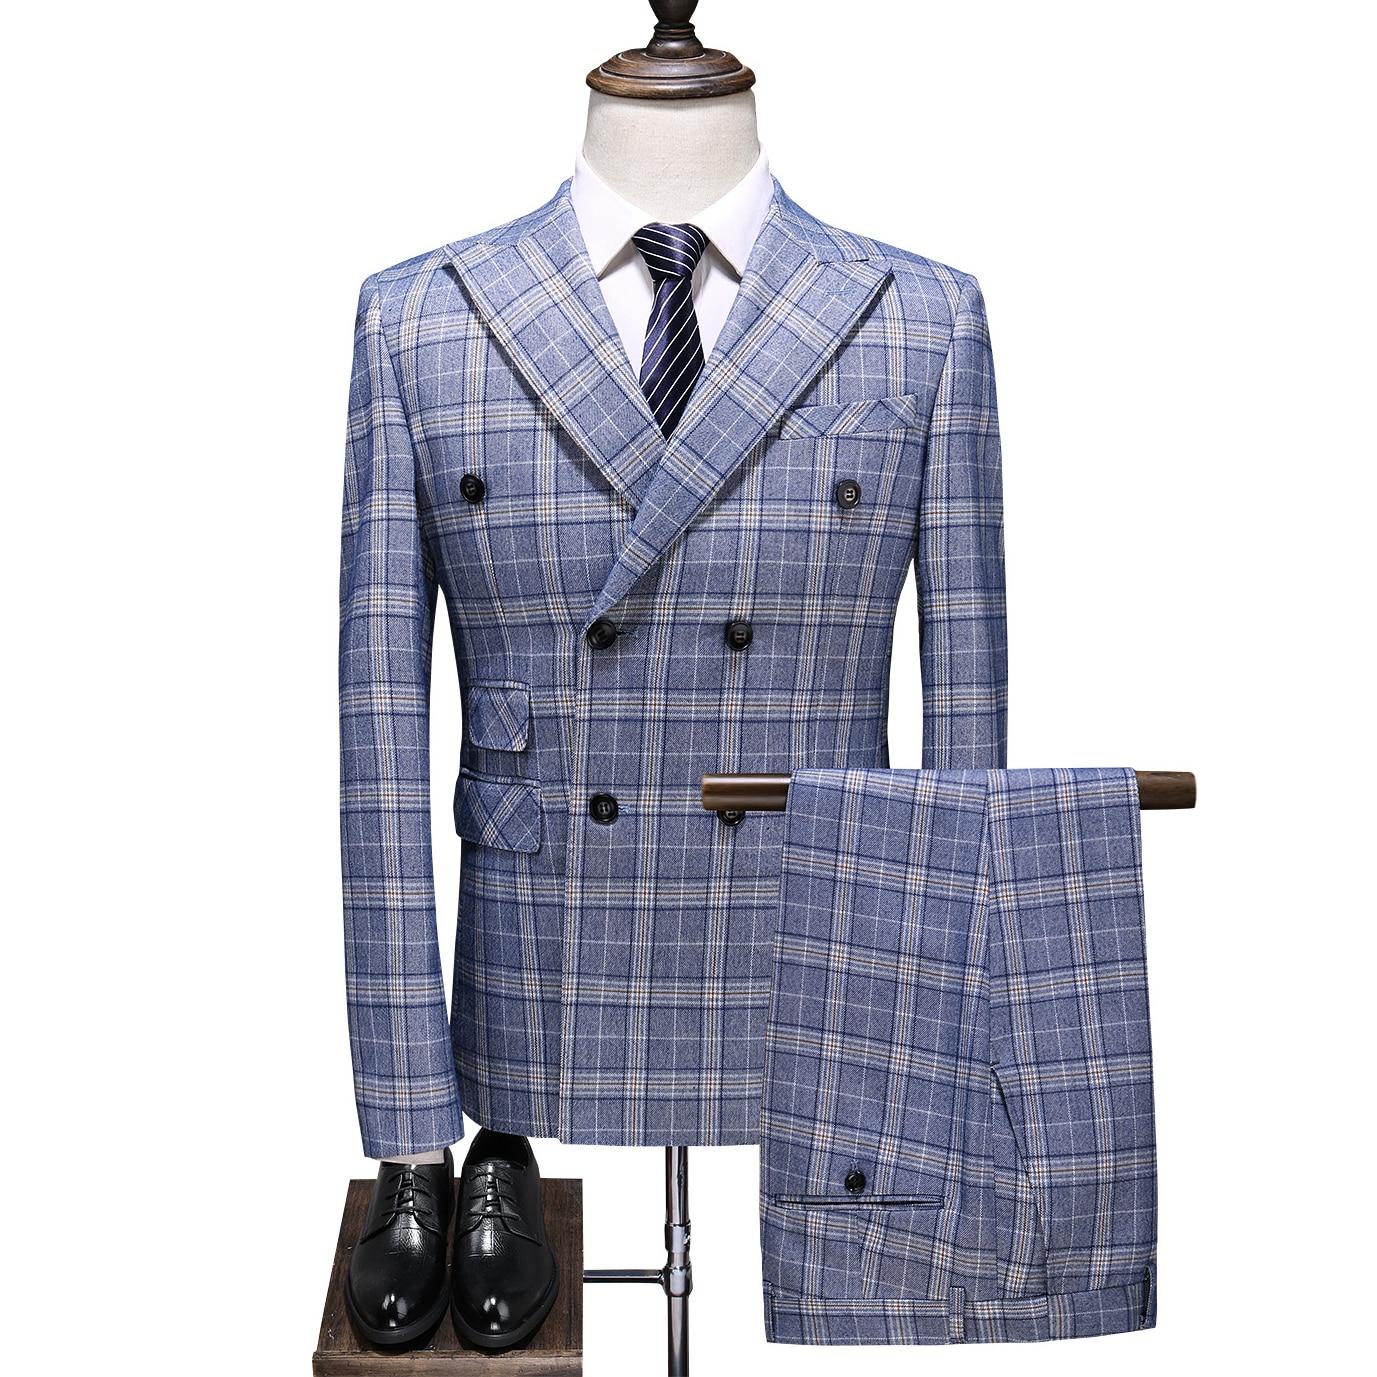 Wedding-Suit Suits Blazers Men Costume Slim-Fit Classic Business Male Mens Party Formal